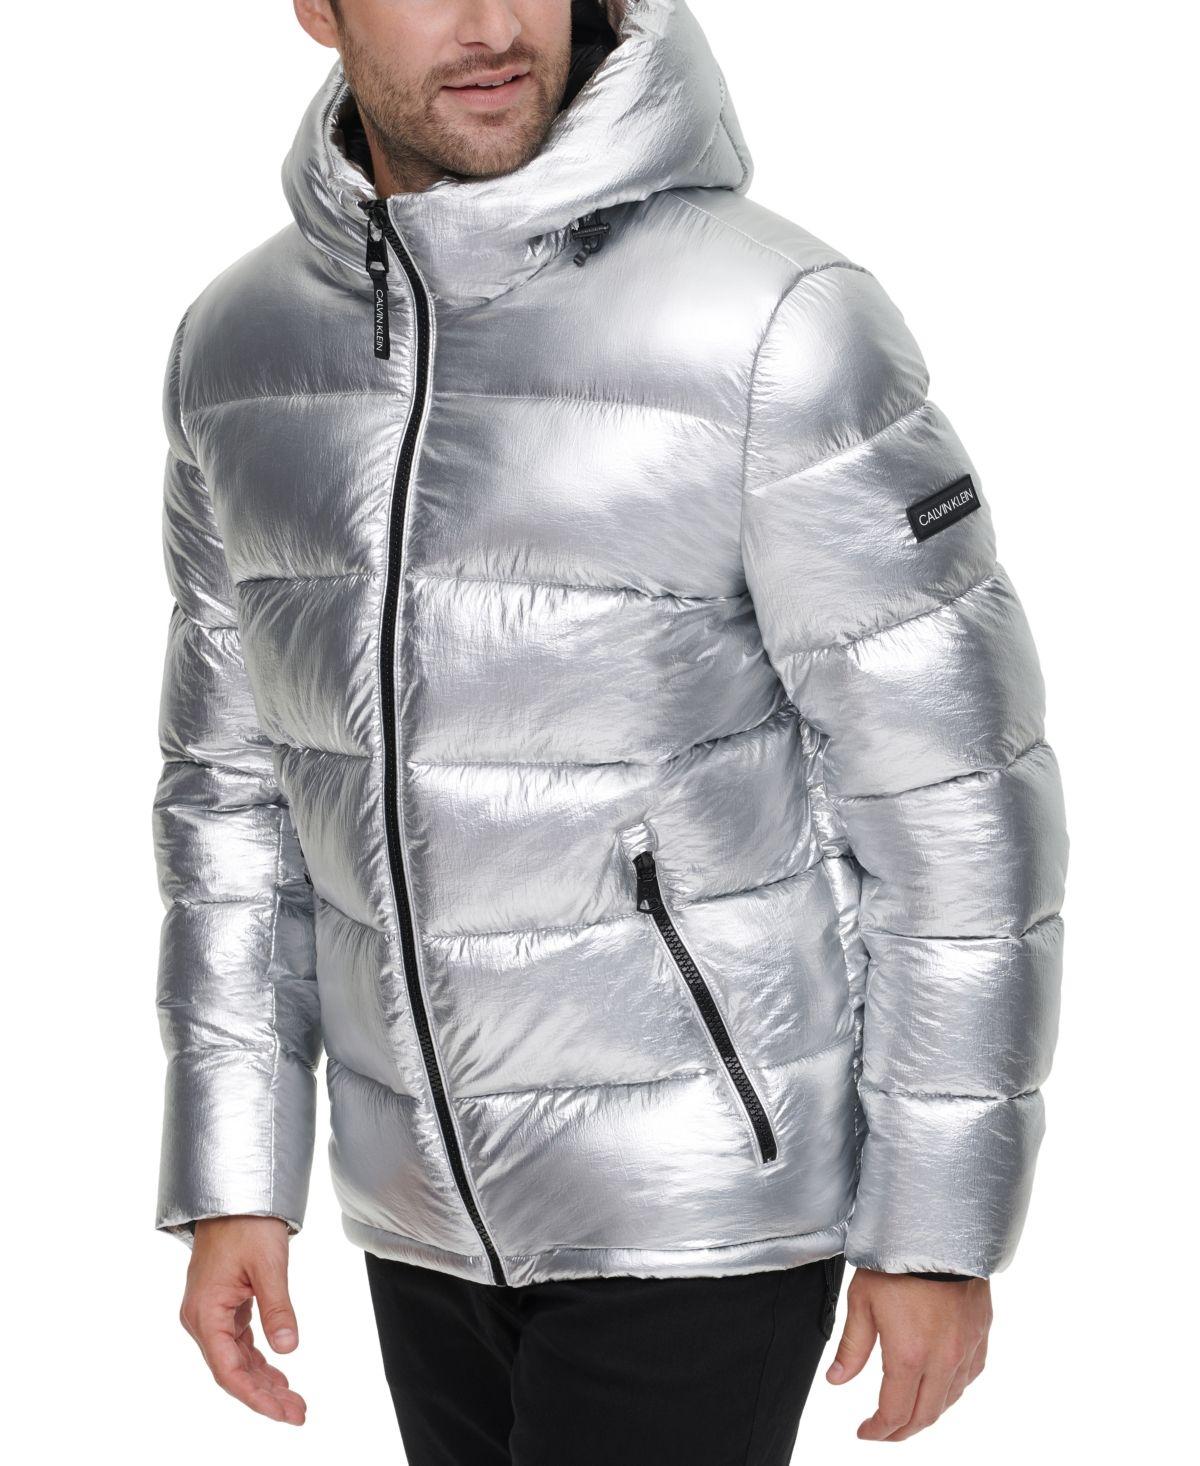 Calvin Klein Men S High Shine Puffer Jacket Reviews Coats Jackets Men Macy S In 2021 Mens Puffer Jacket Puffer Jackets Shiny Jacket [ 1466 x 1200 Pixel ]